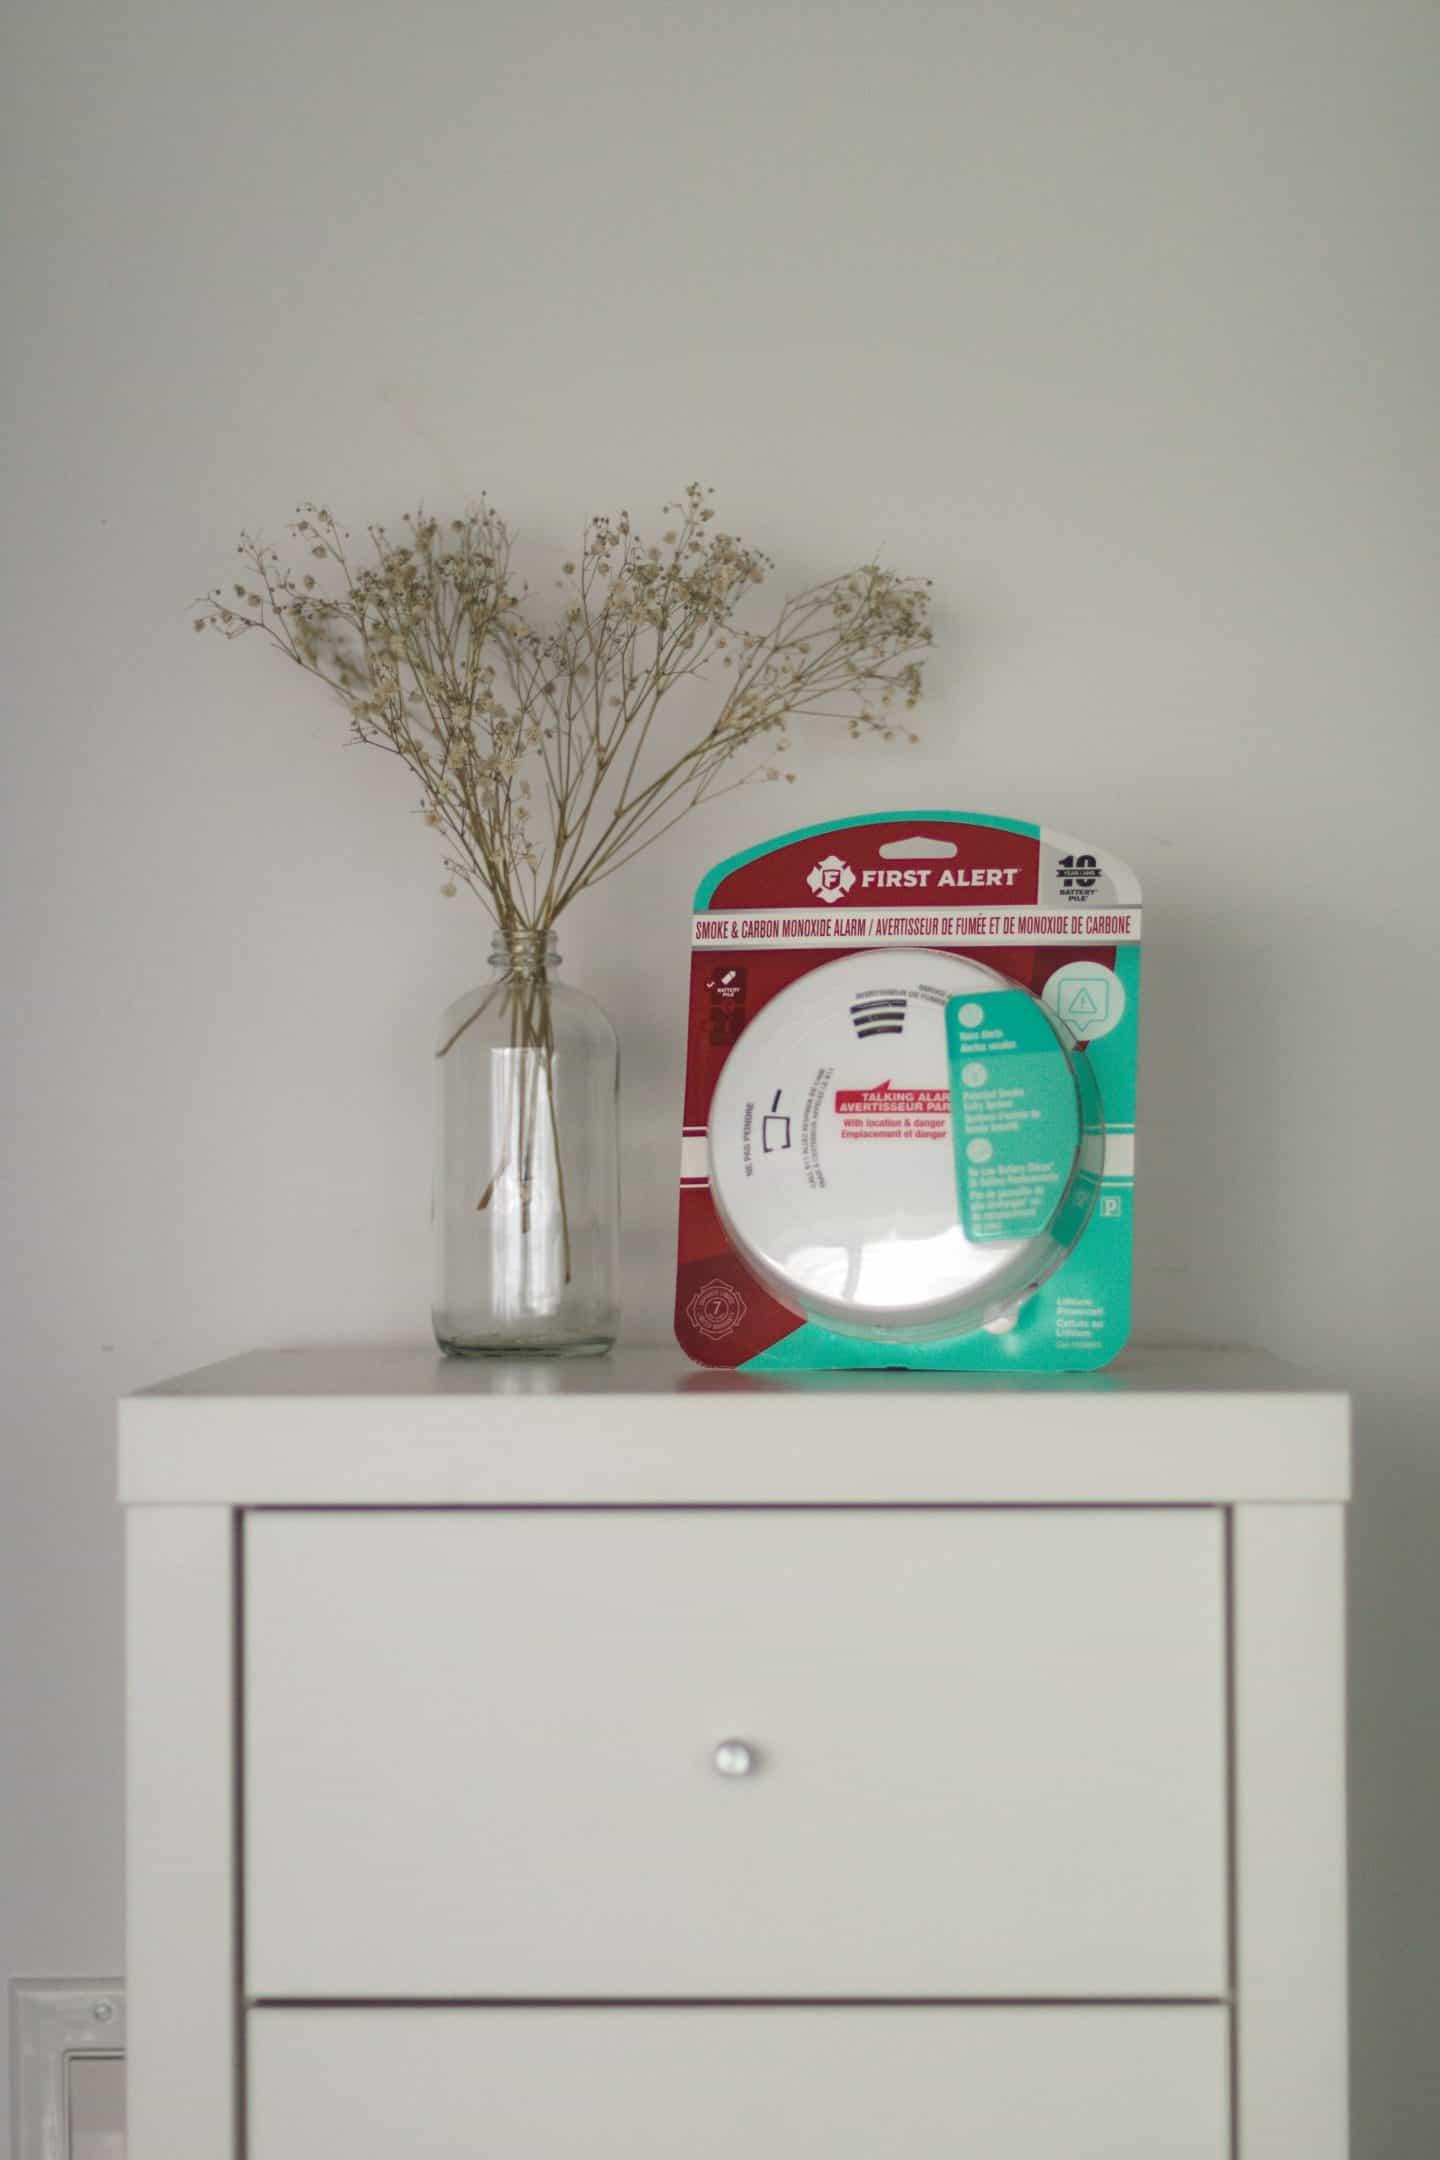 First Alert Combination Smoke and Carbon Monoxide Alarm